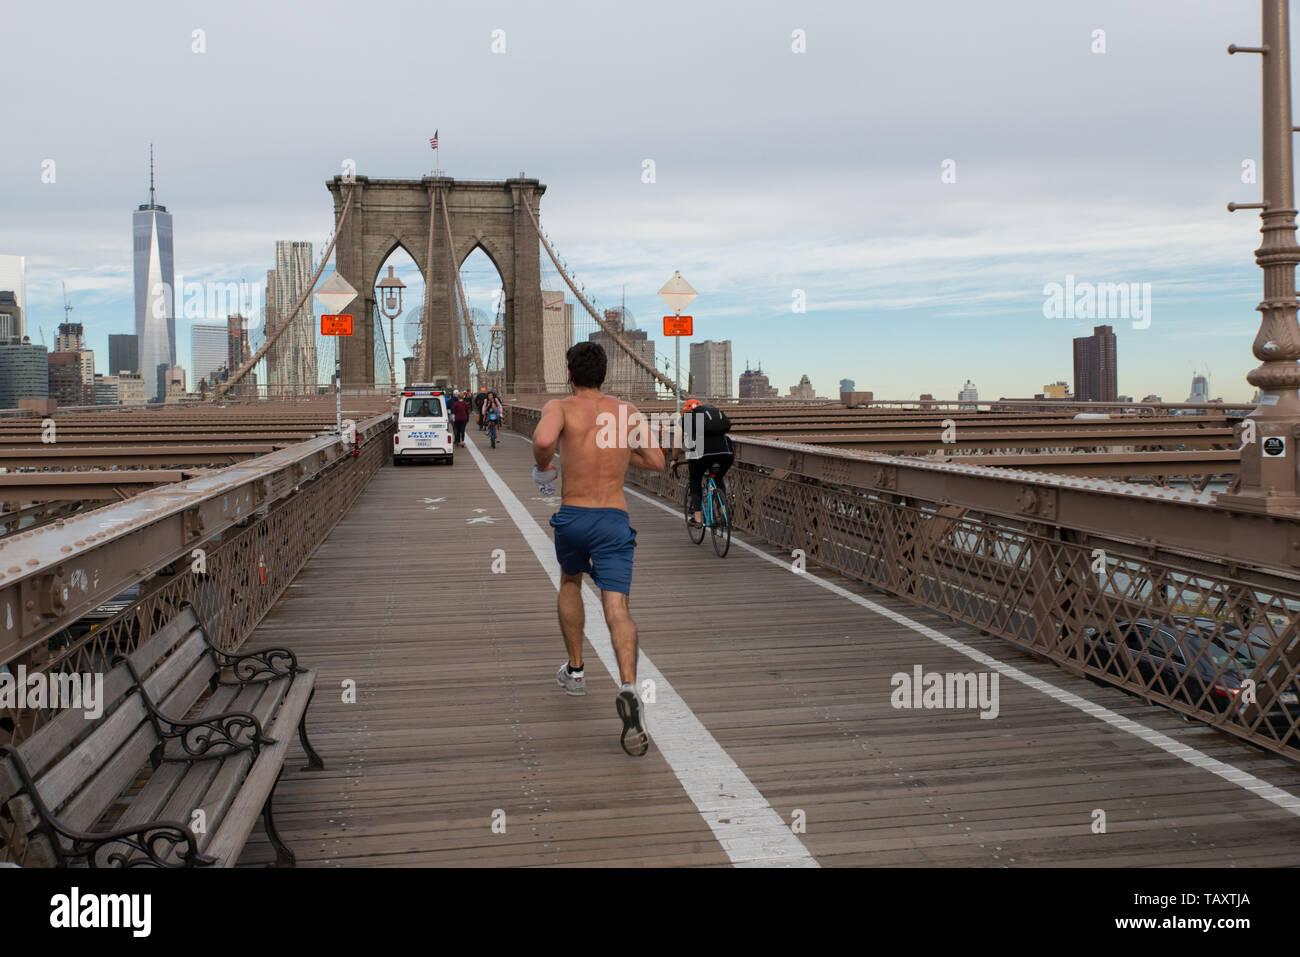 Rüttler auf Brooklyn-Brücke, New York City, USA. / Joggers on Brooklyn bridge, New York City, USA. / Joggeur sur le pont de Brooklyn, New York, USA. - Stock Image